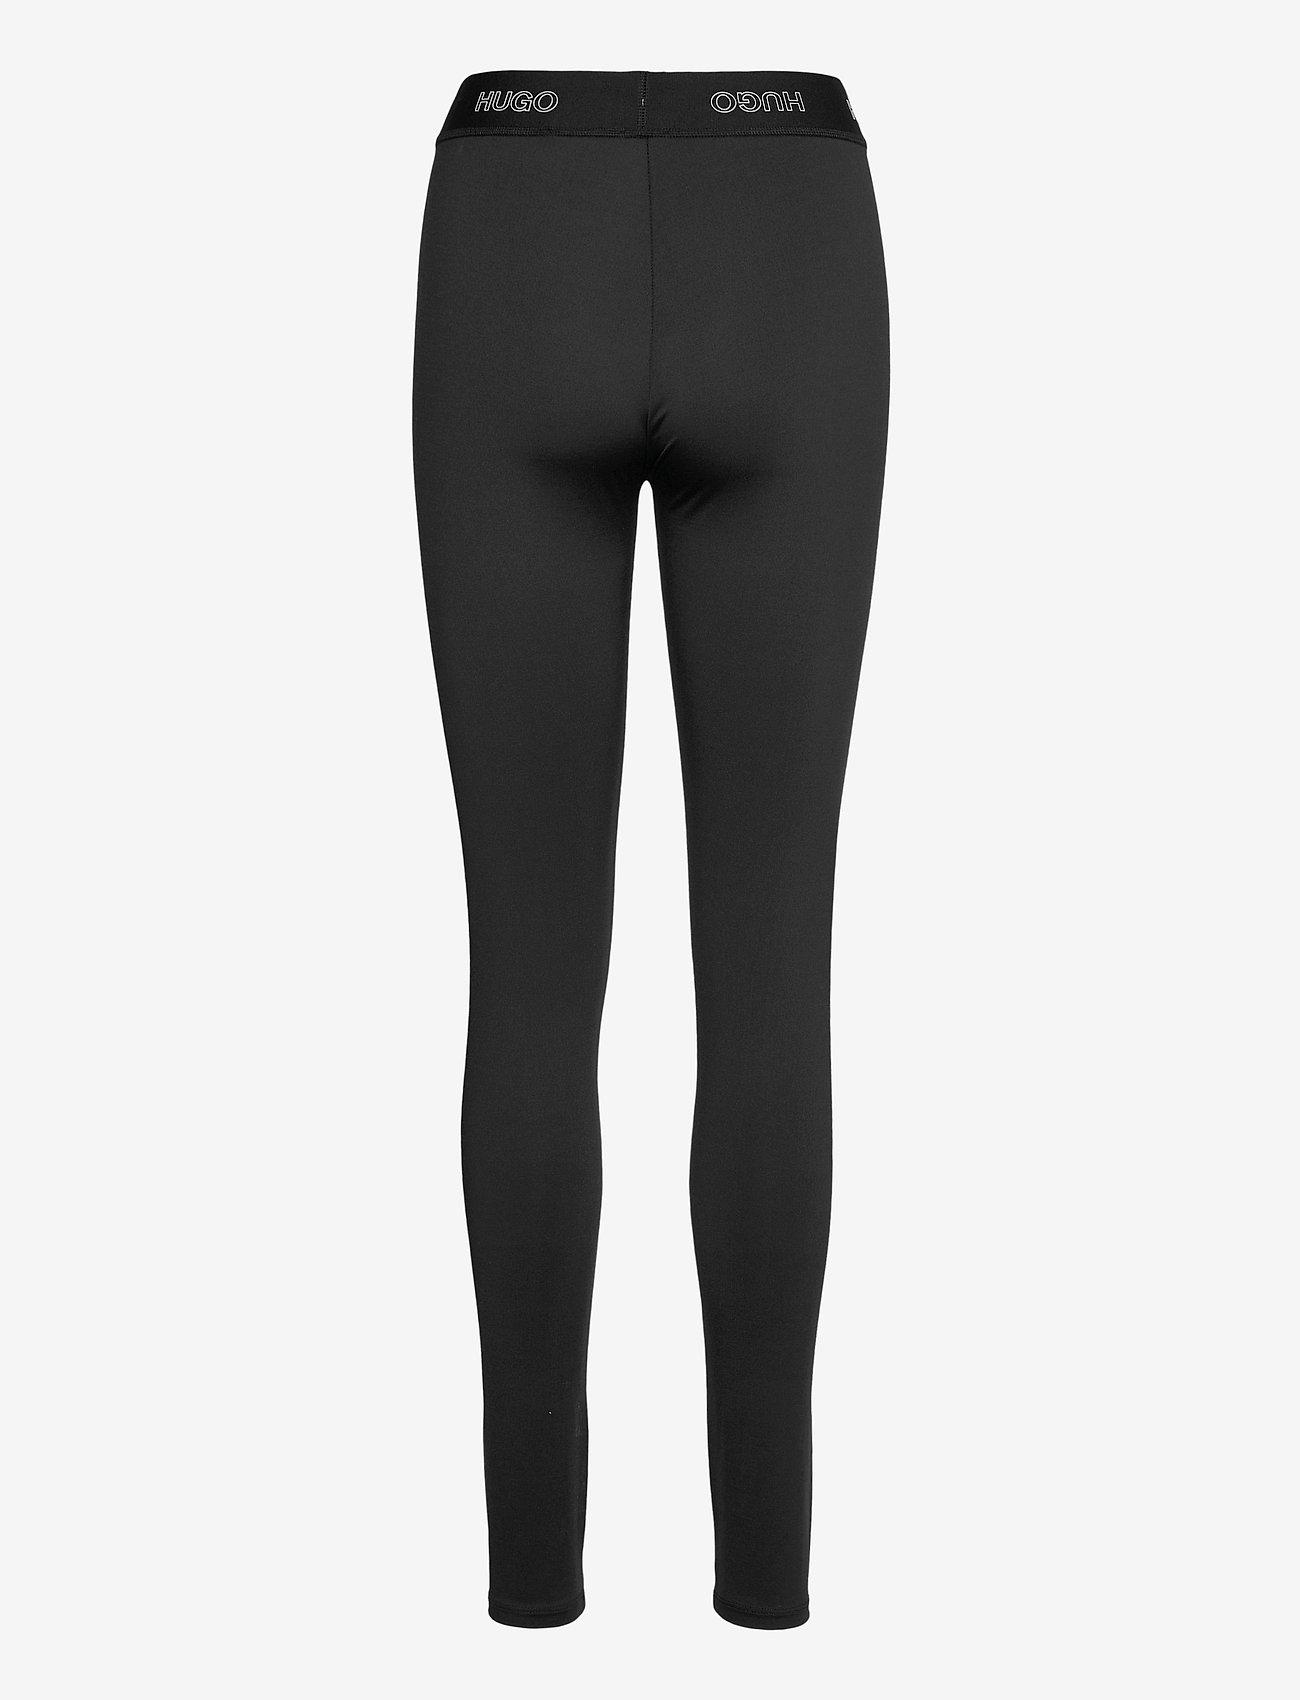 HUGO - Nasabe - leggings - black - 1